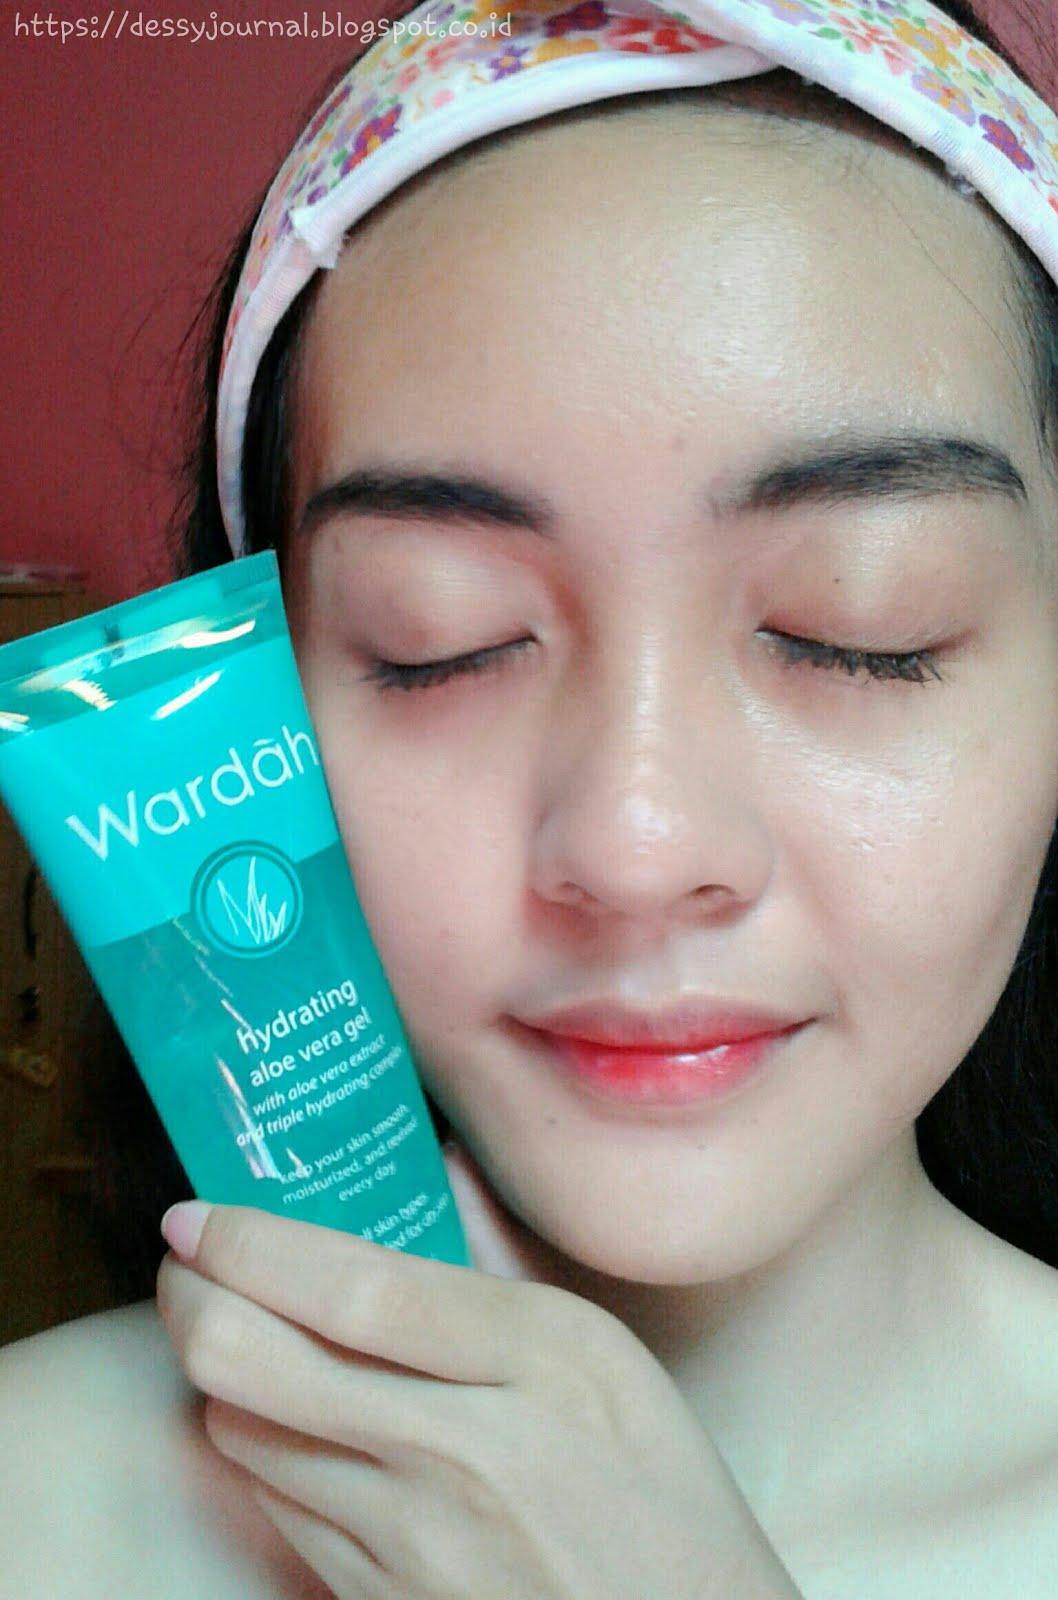 Dessy Journal Review Wardah Hydrating Aloe Vera Gel